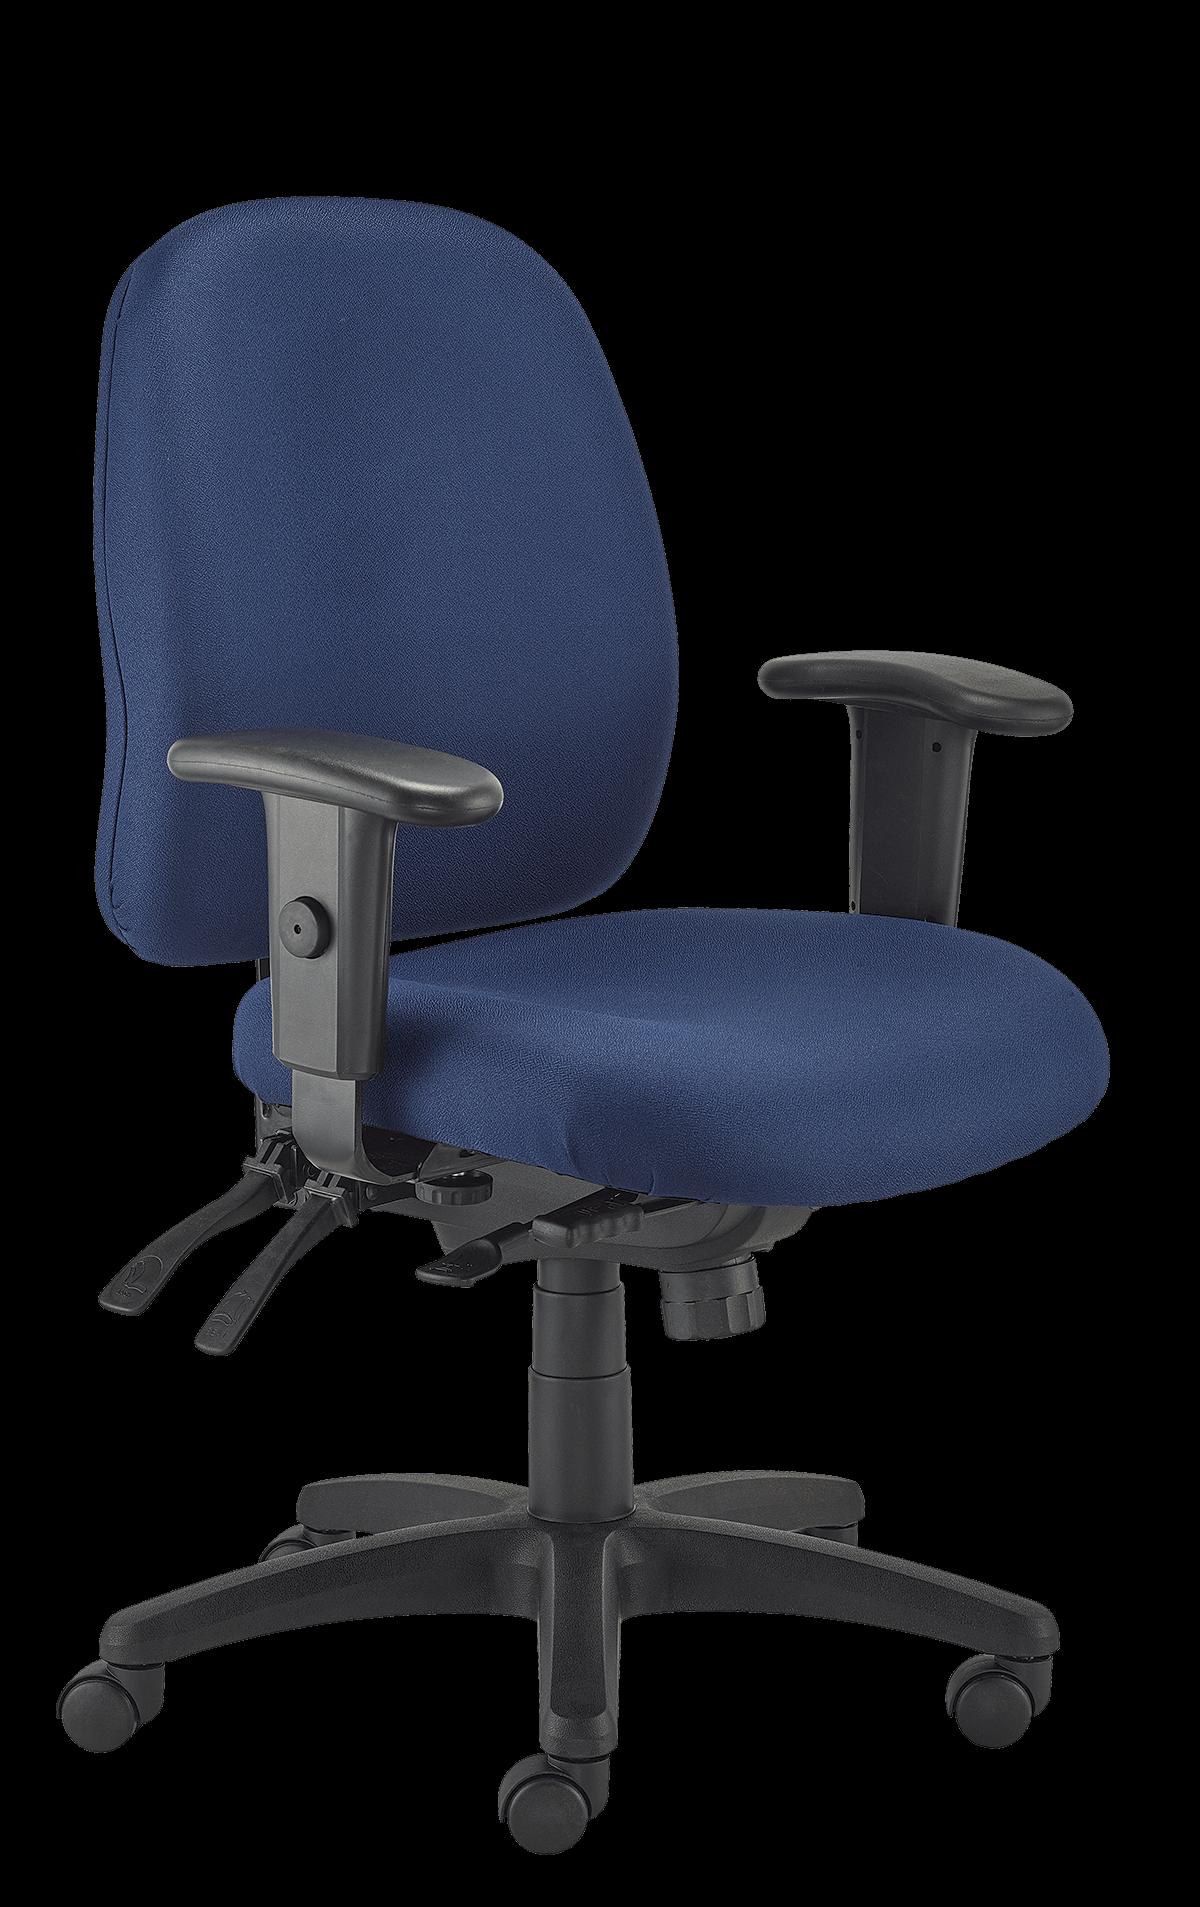 eurotech 4x4 chair in navy